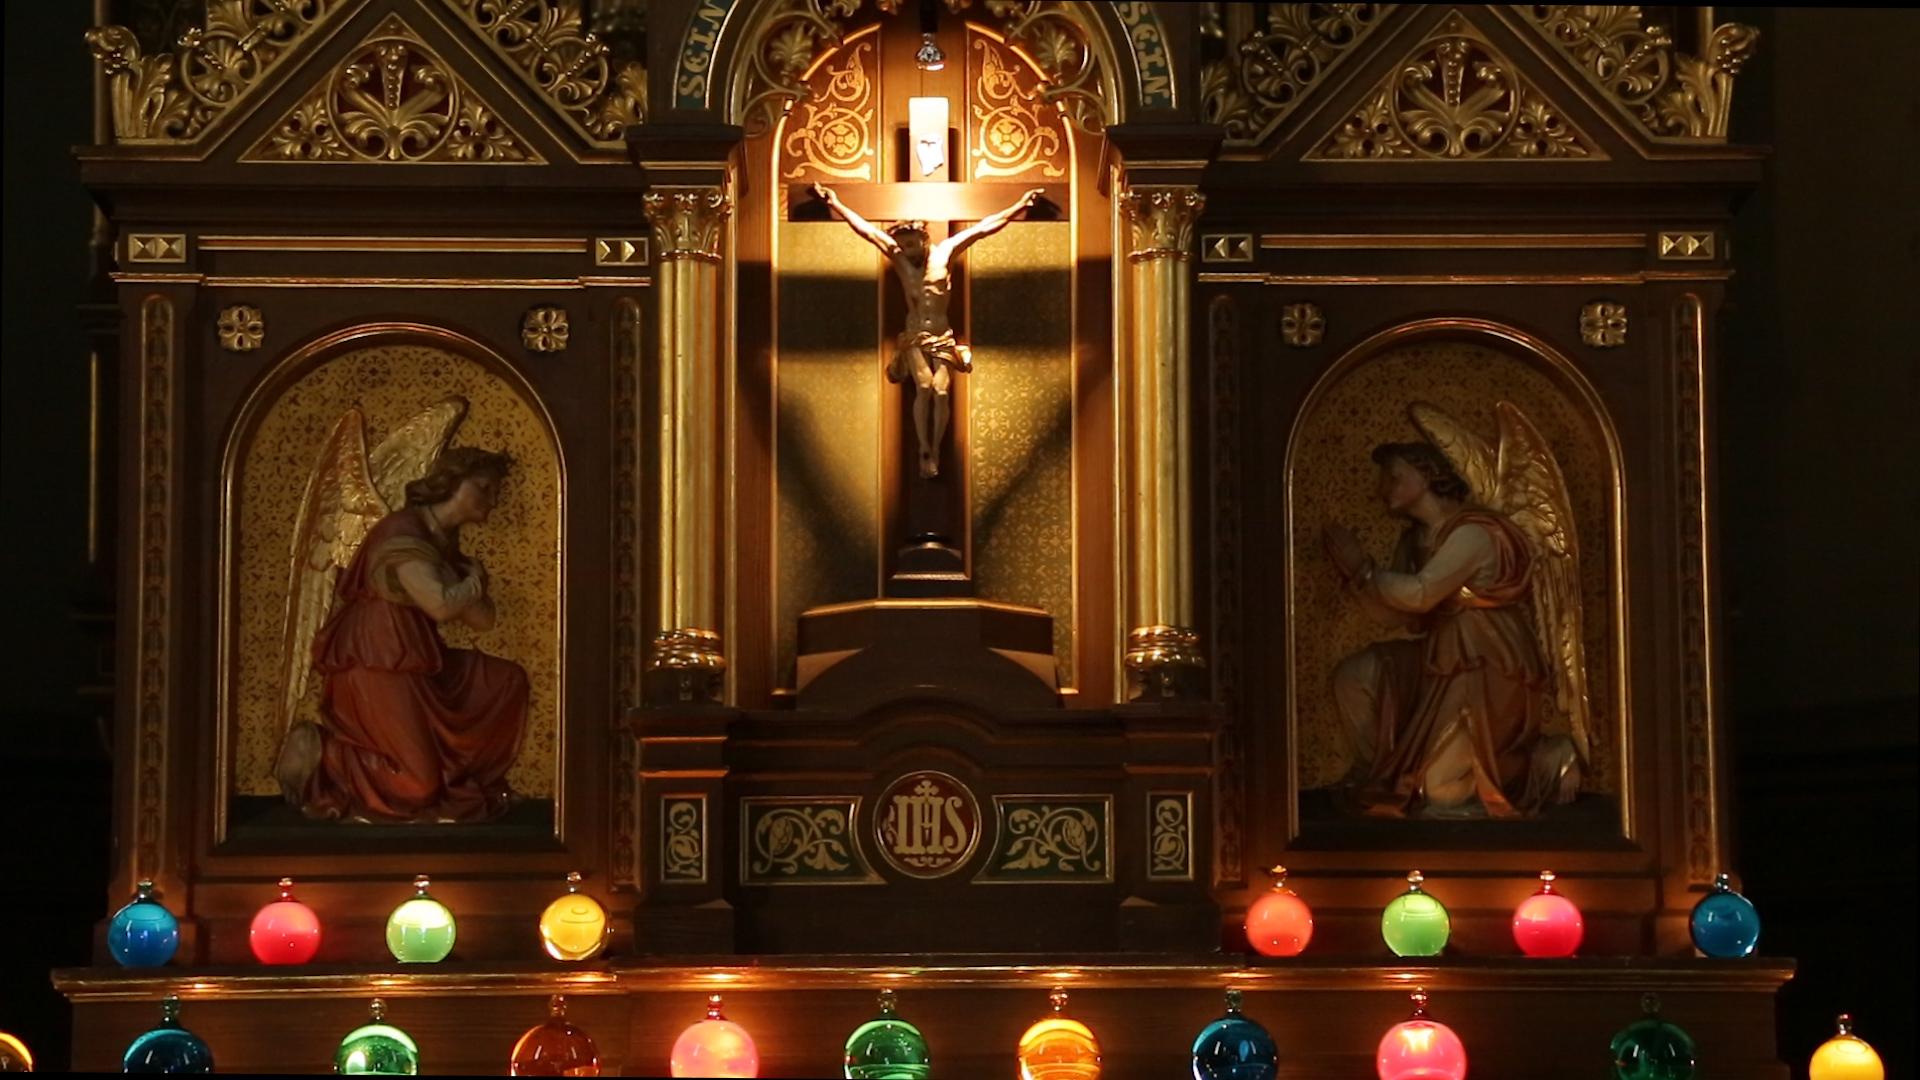 St Martin_Hl Grab_Jesus_Mitte